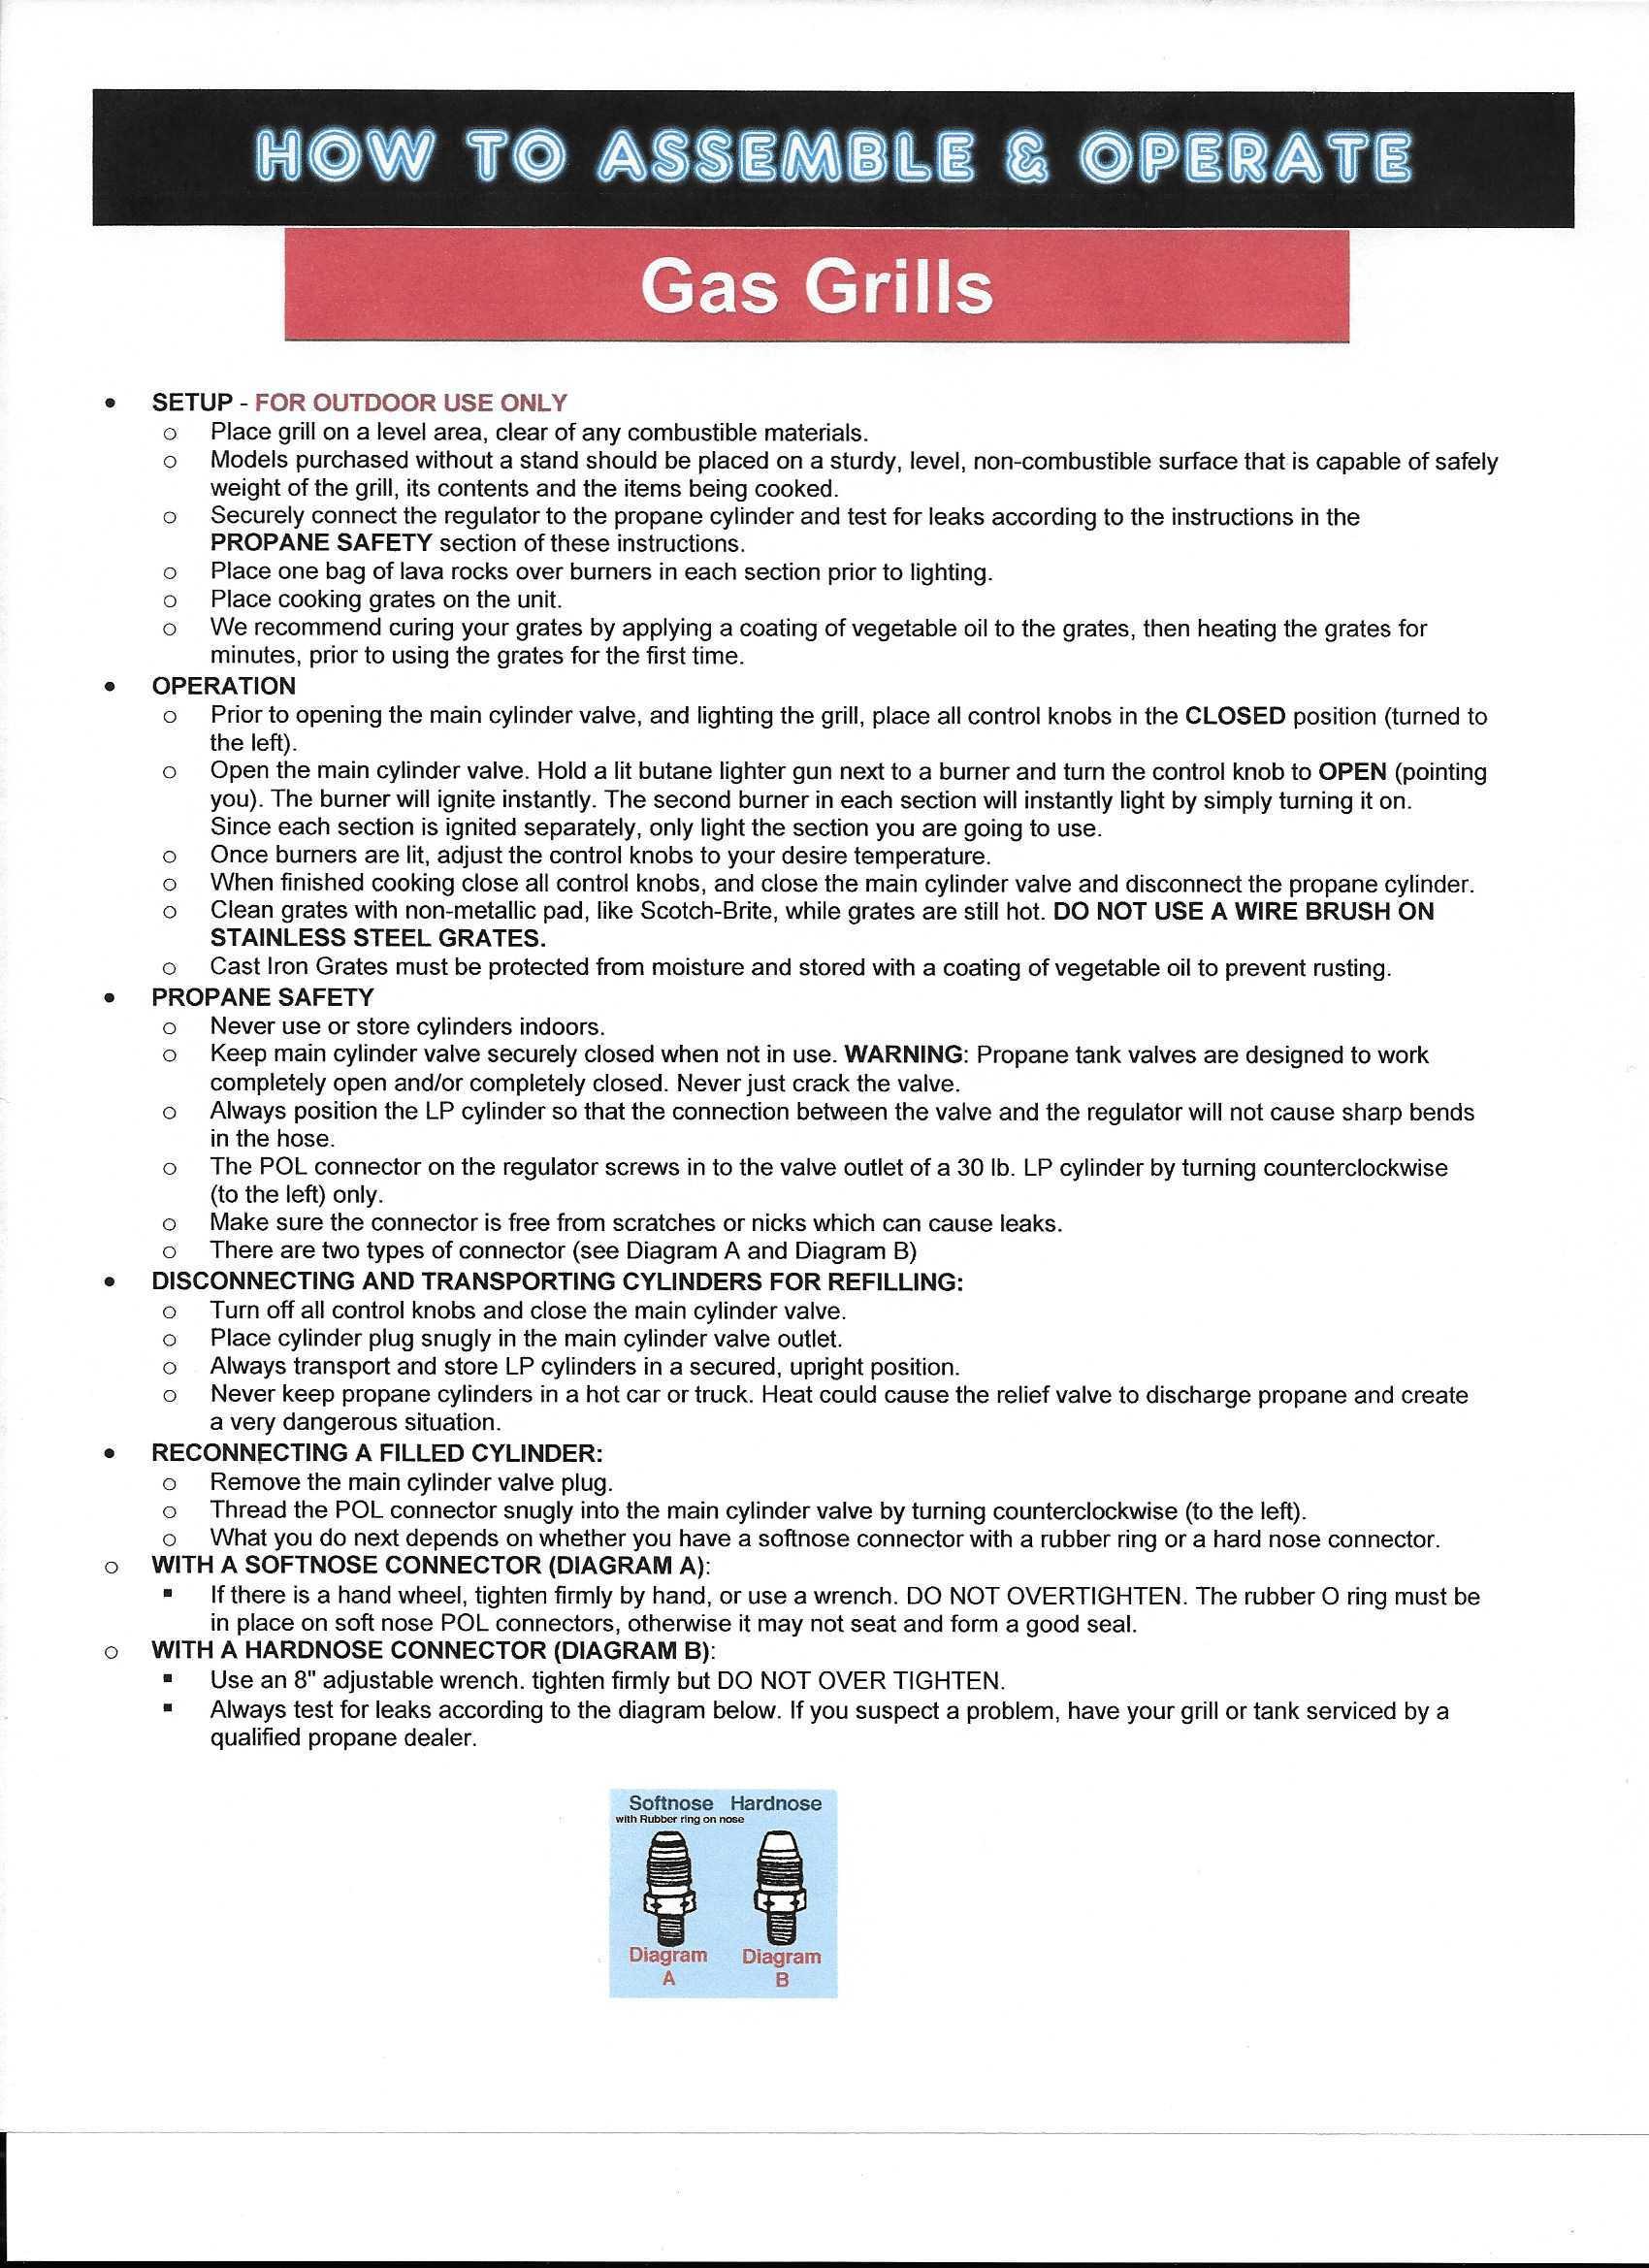 gas-grill-instructions0001.jpg